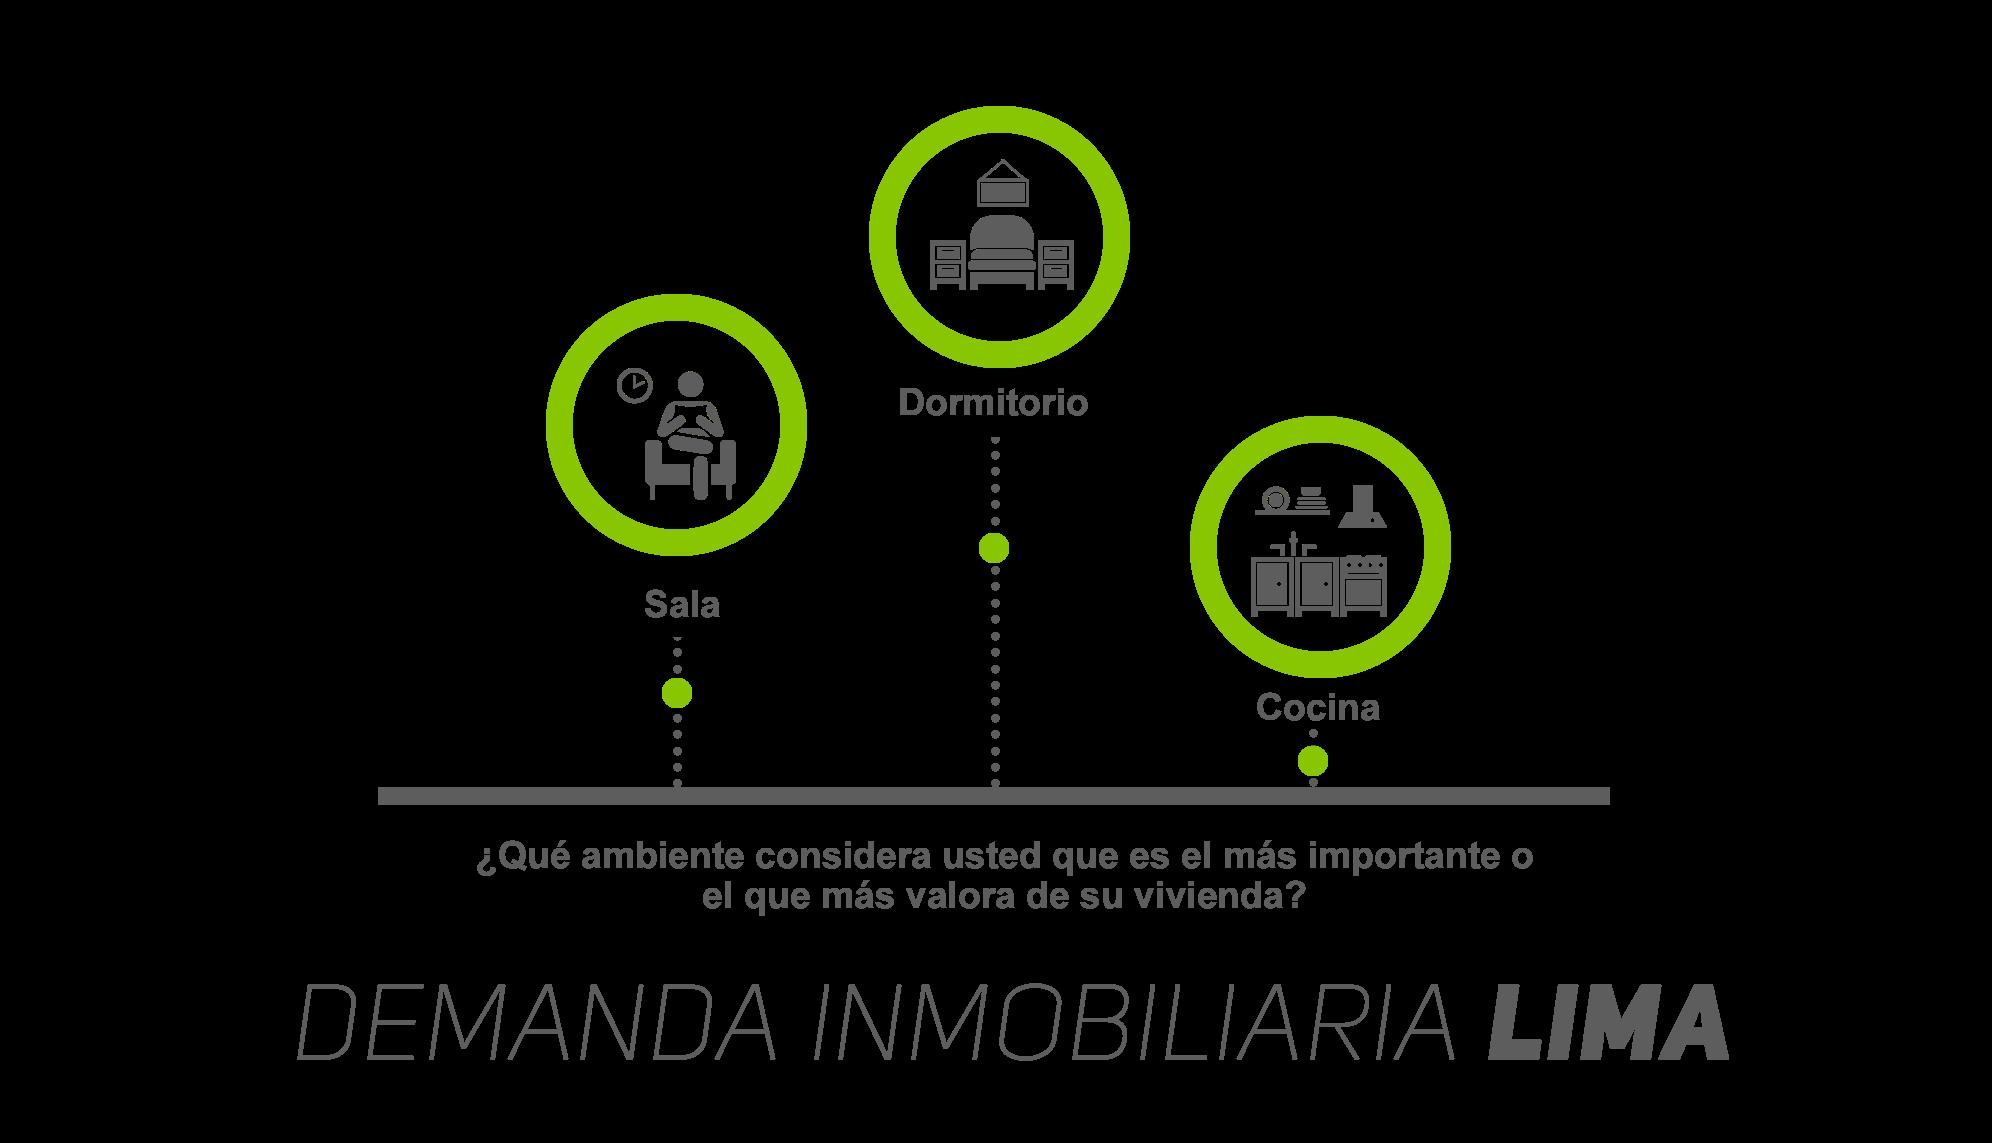 Demanda Inmobiliaria Lima 2015